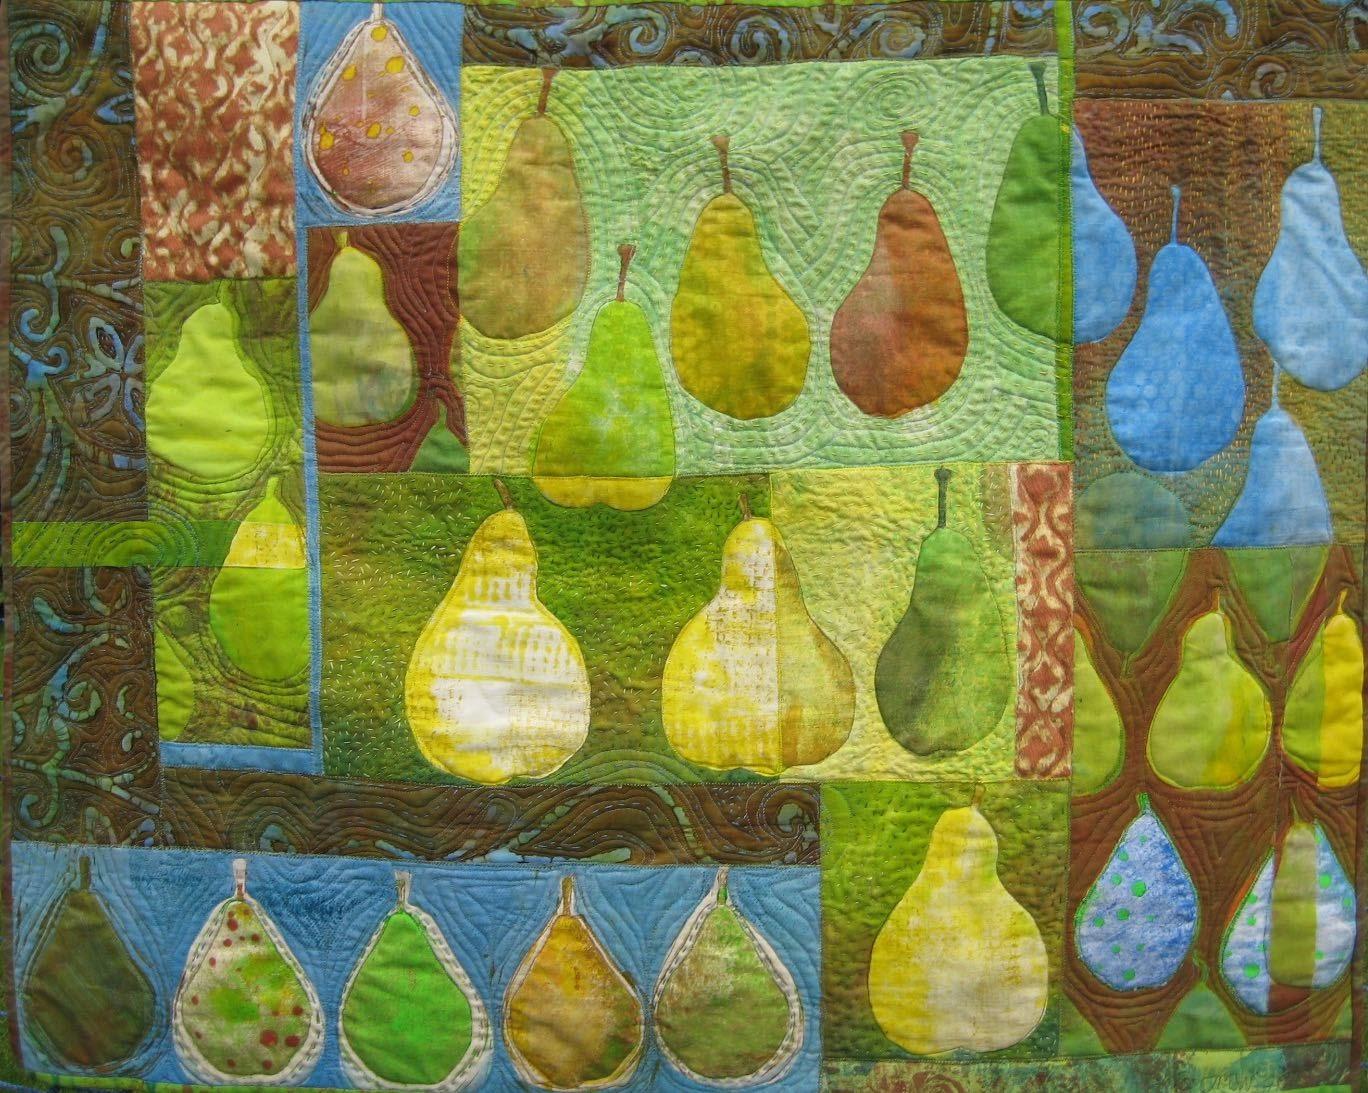 The Wonder of Pears